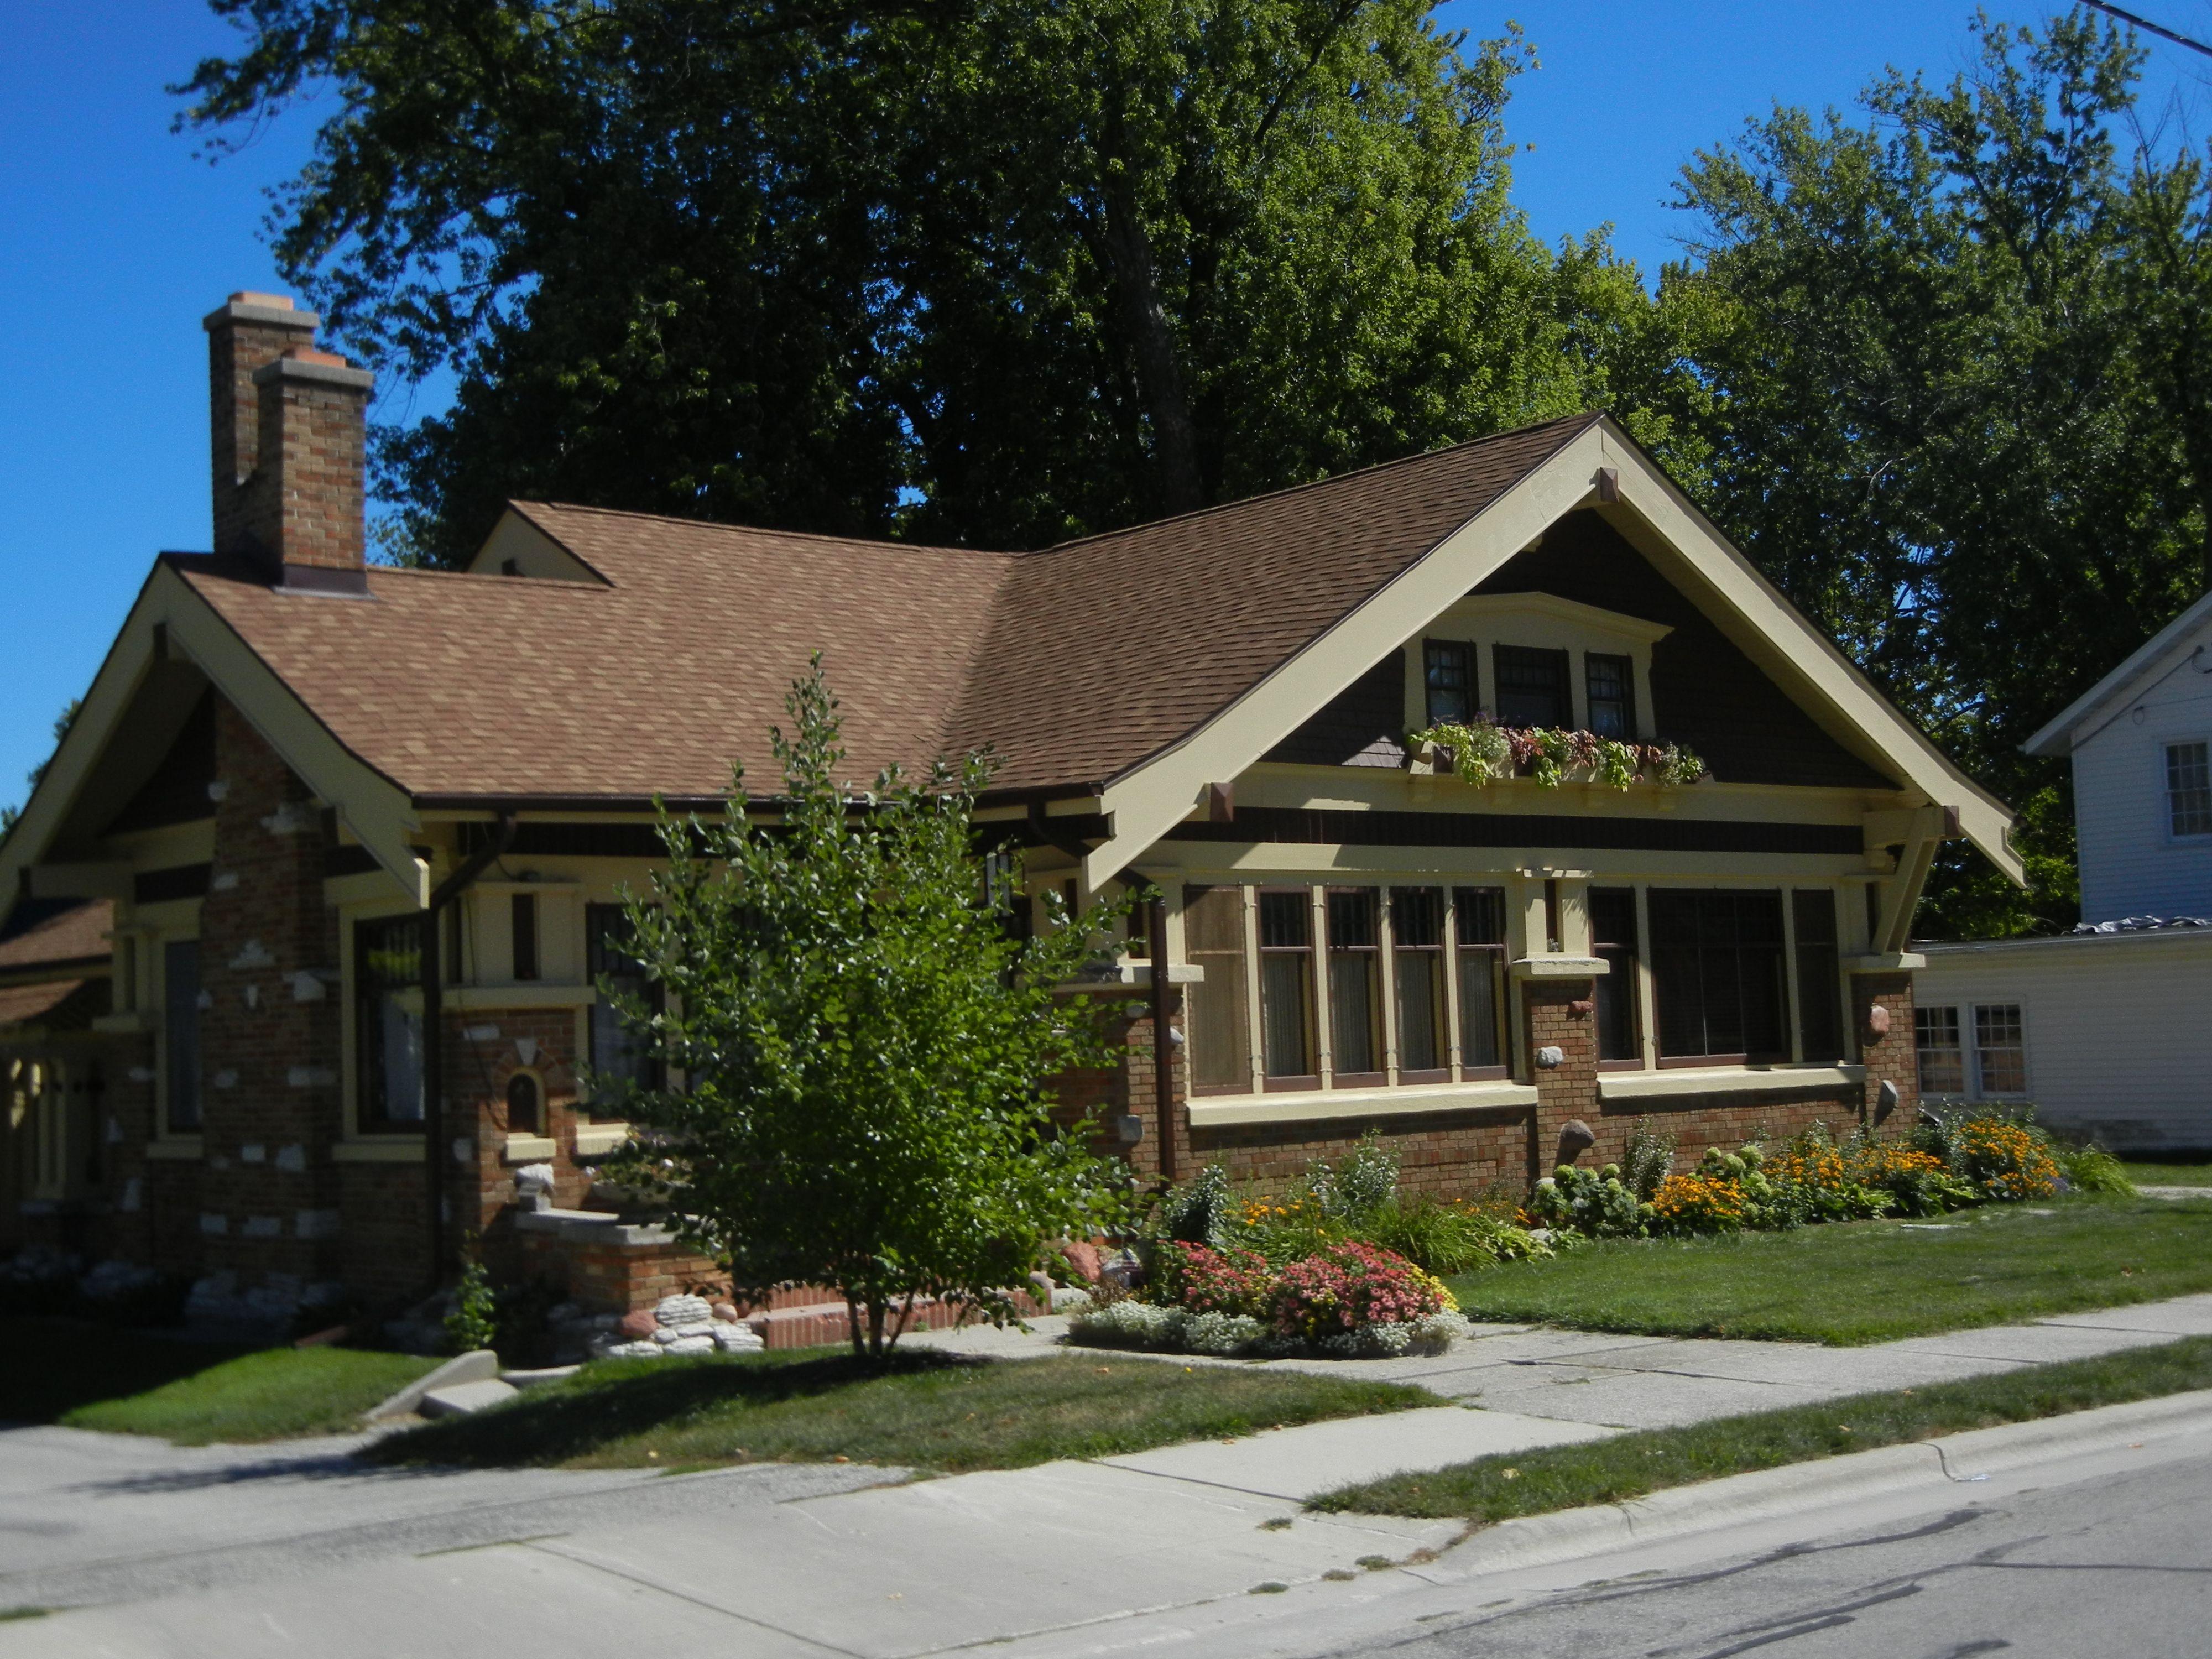 E c love house - Houses built inhours ...